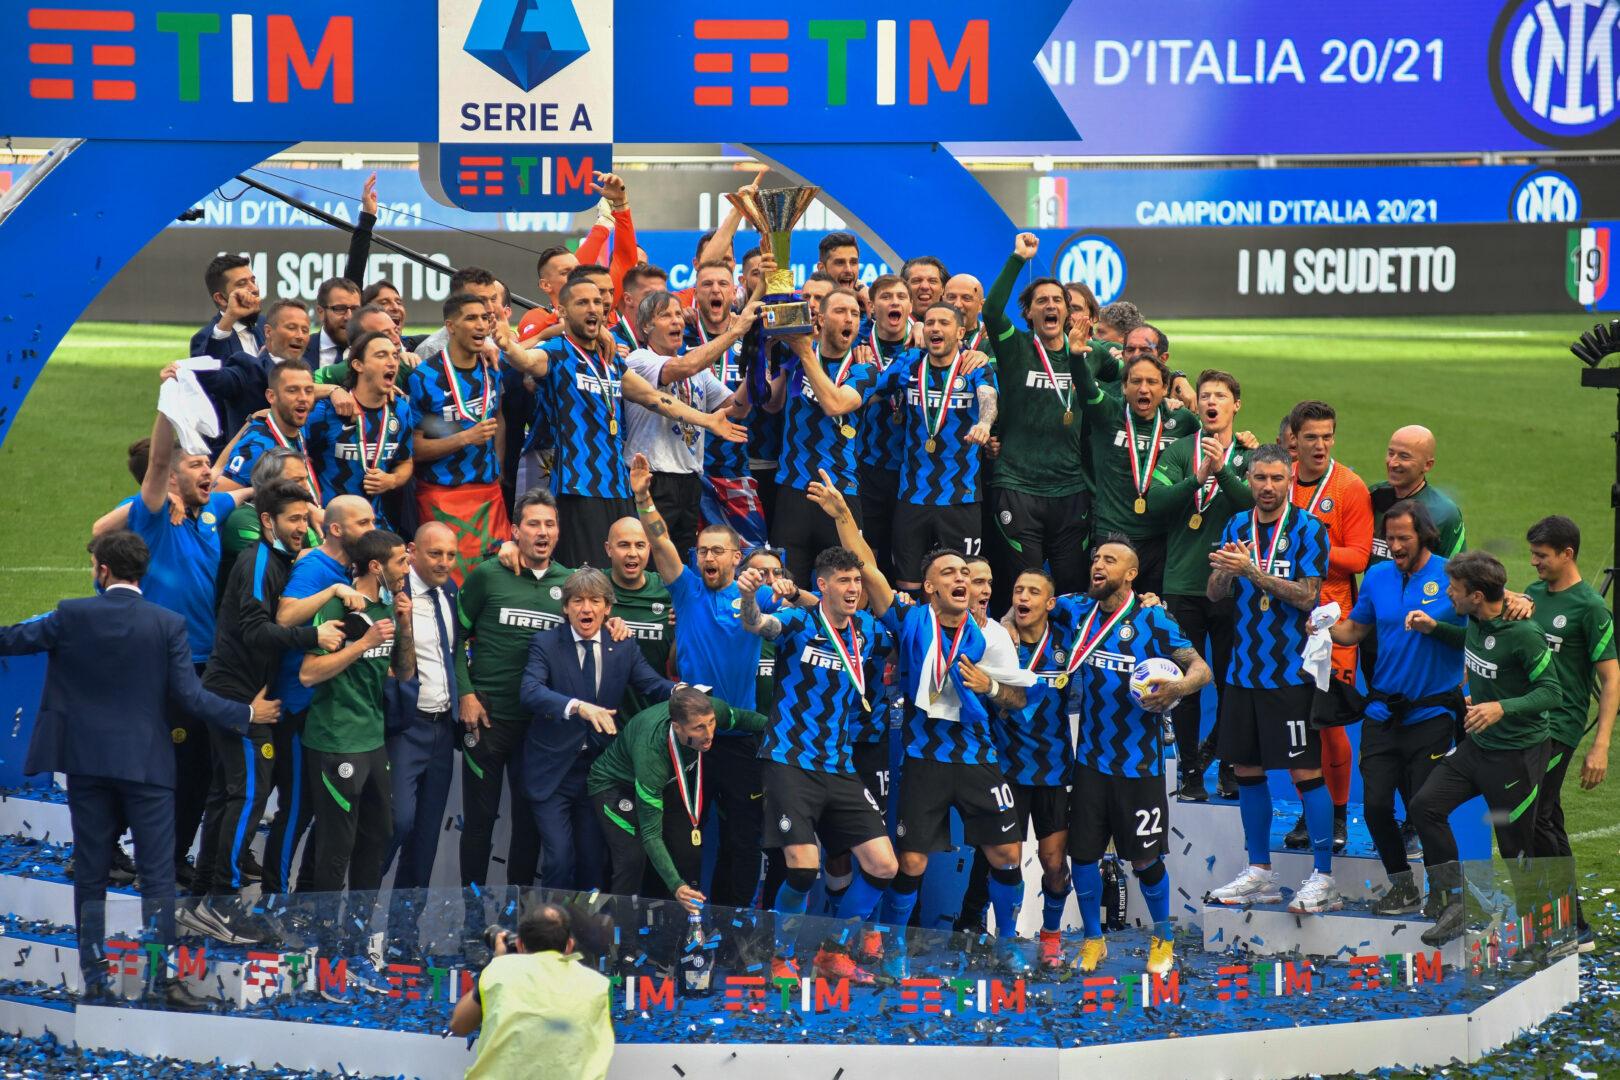 Vorschau Serie A Teil 1: Inter, Fiorentina, Genua, Salernitana